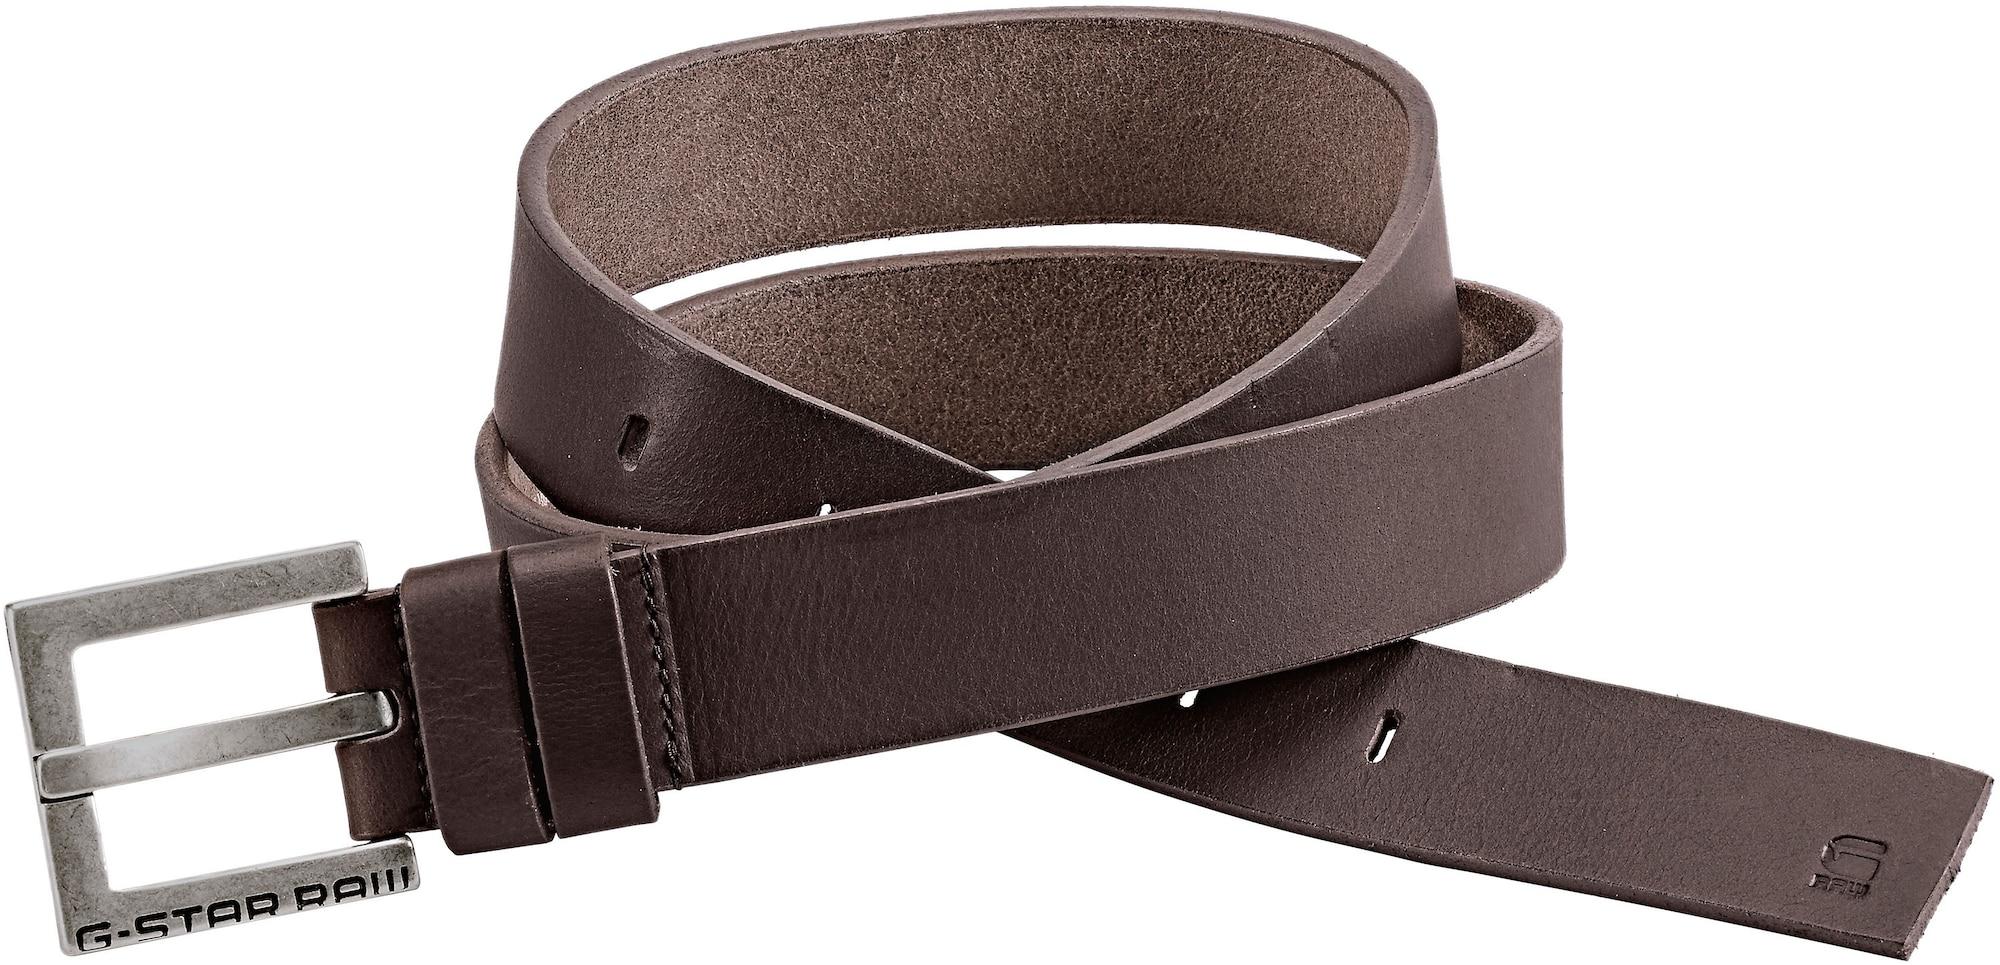 Ledergürtel 'Duko' | Accessoires > Gürtel > Ledergürtel | Dunkelbraun | G-Star Raw